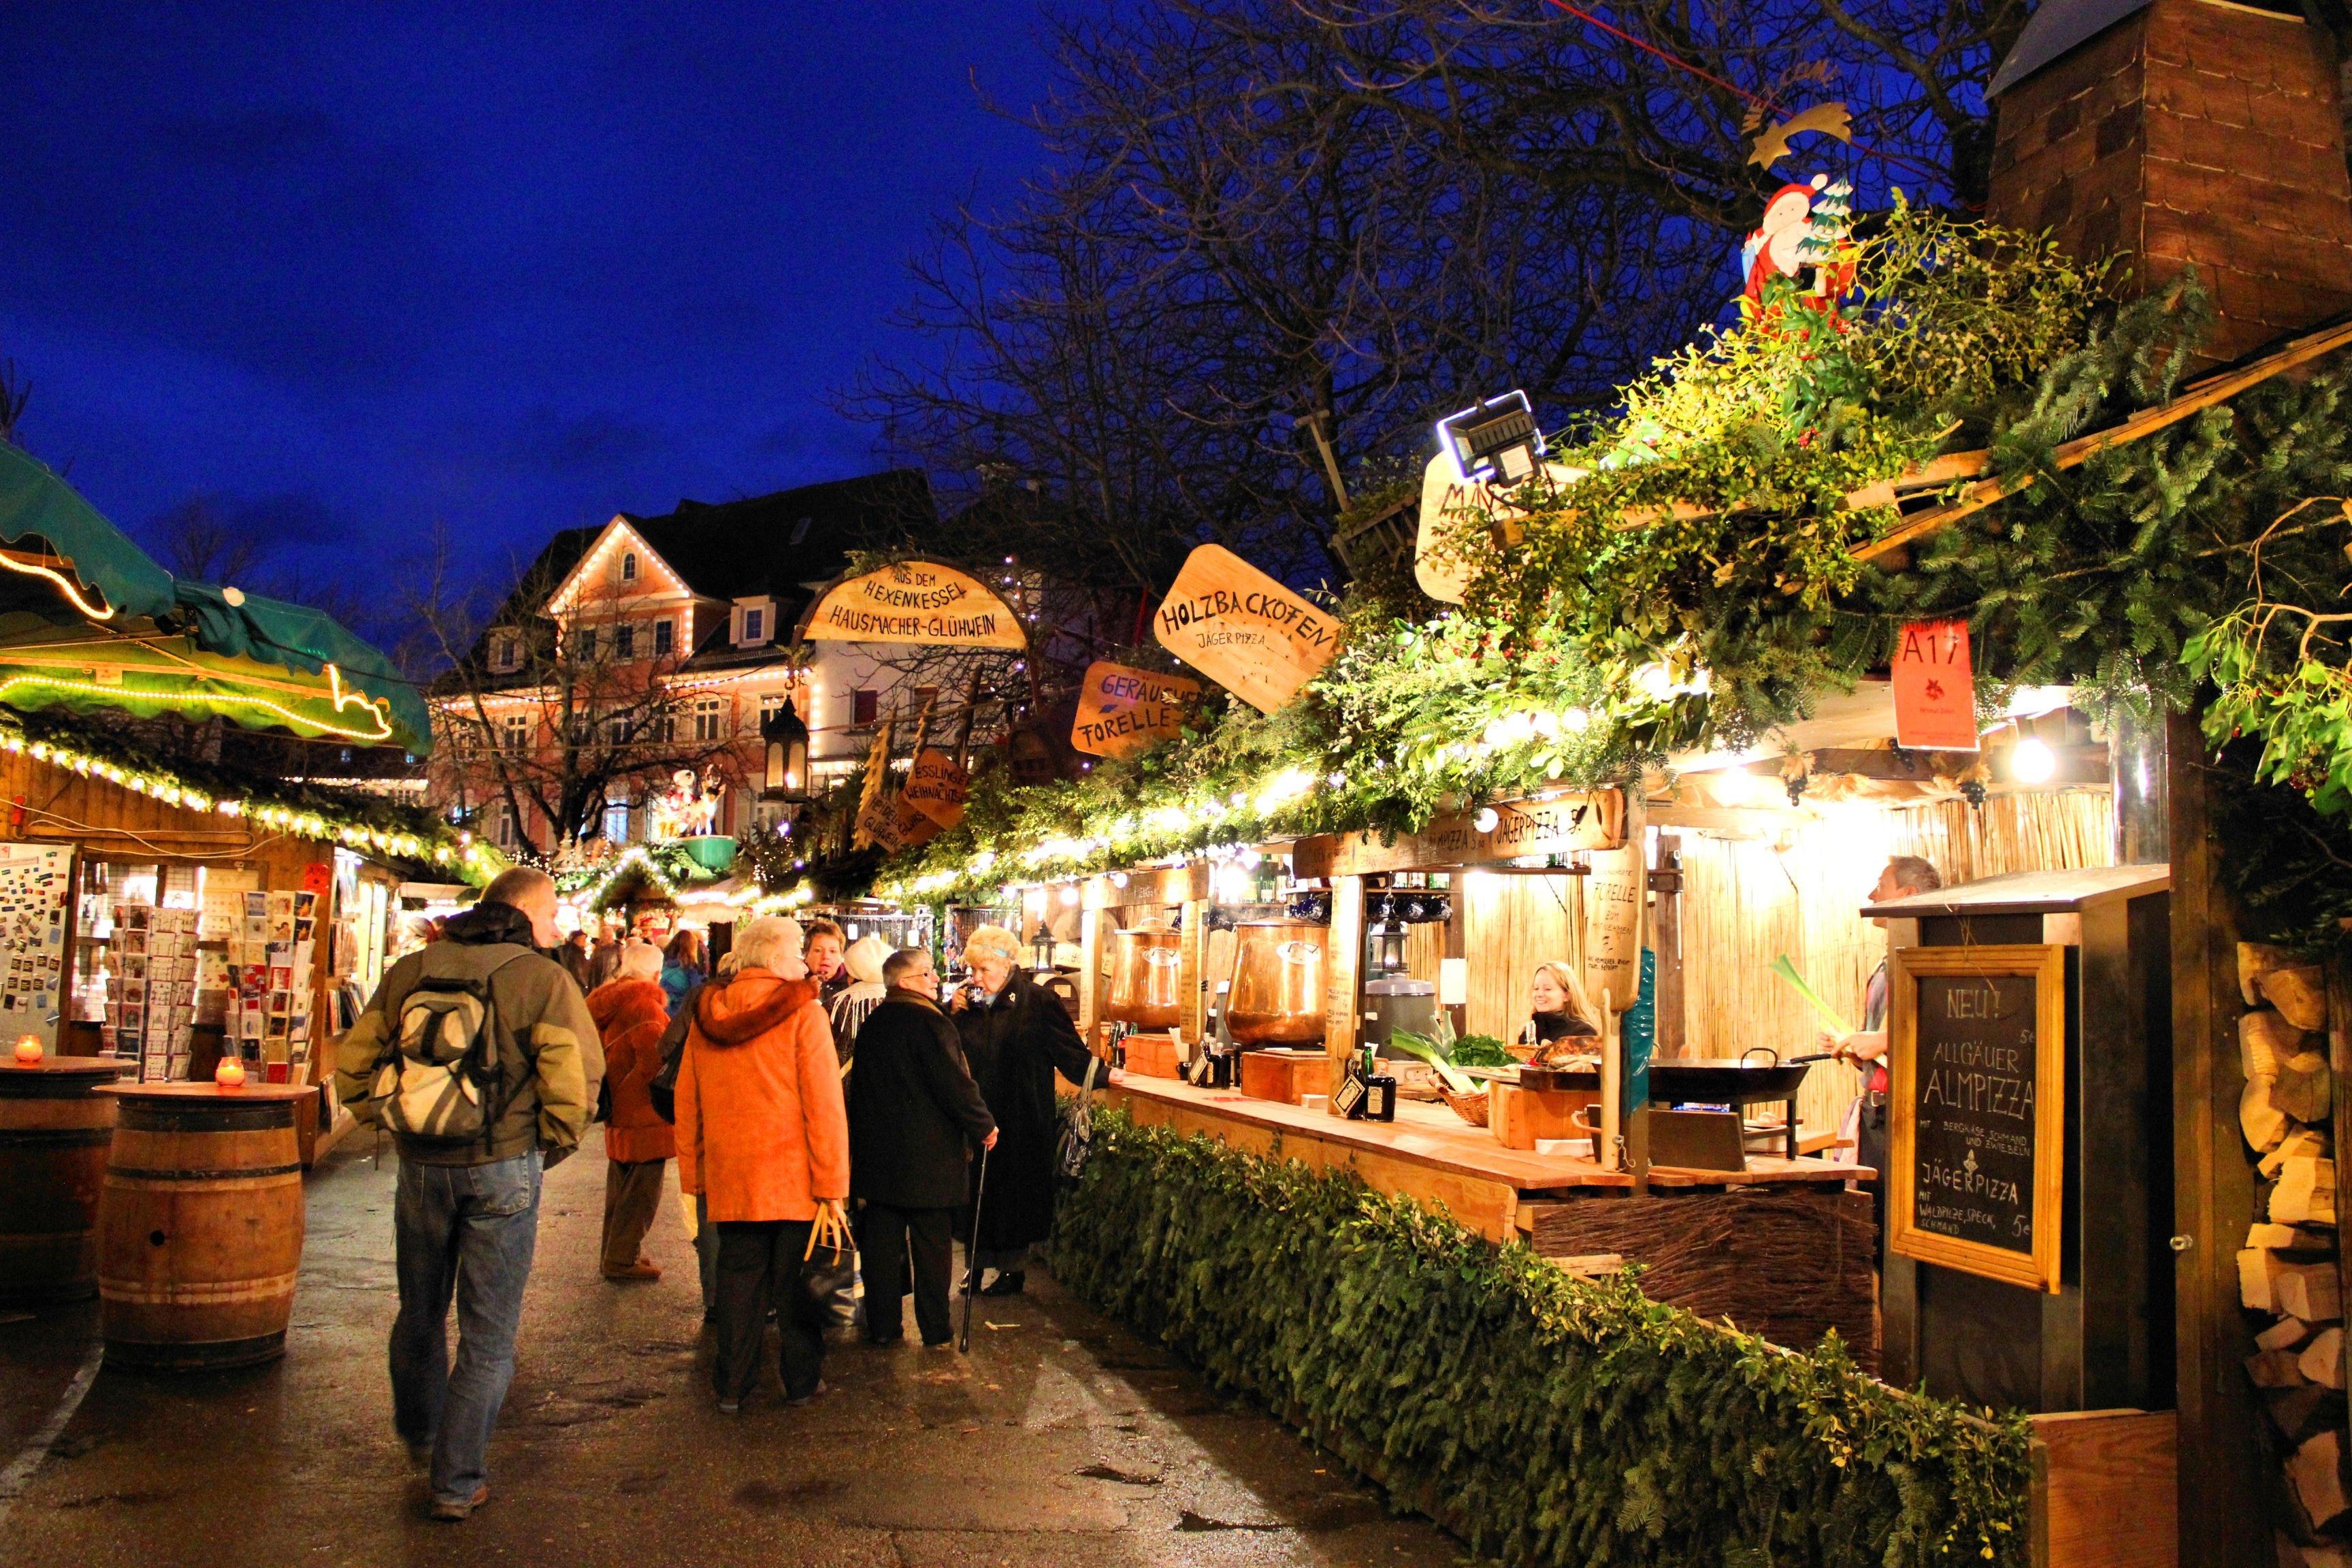 esslingen christmas market.jpg?resize=412,232 - 《歐洲嘉年華、德國啤酒節》台北101限時登場!集結11國歐陸主題美食小帳篷!